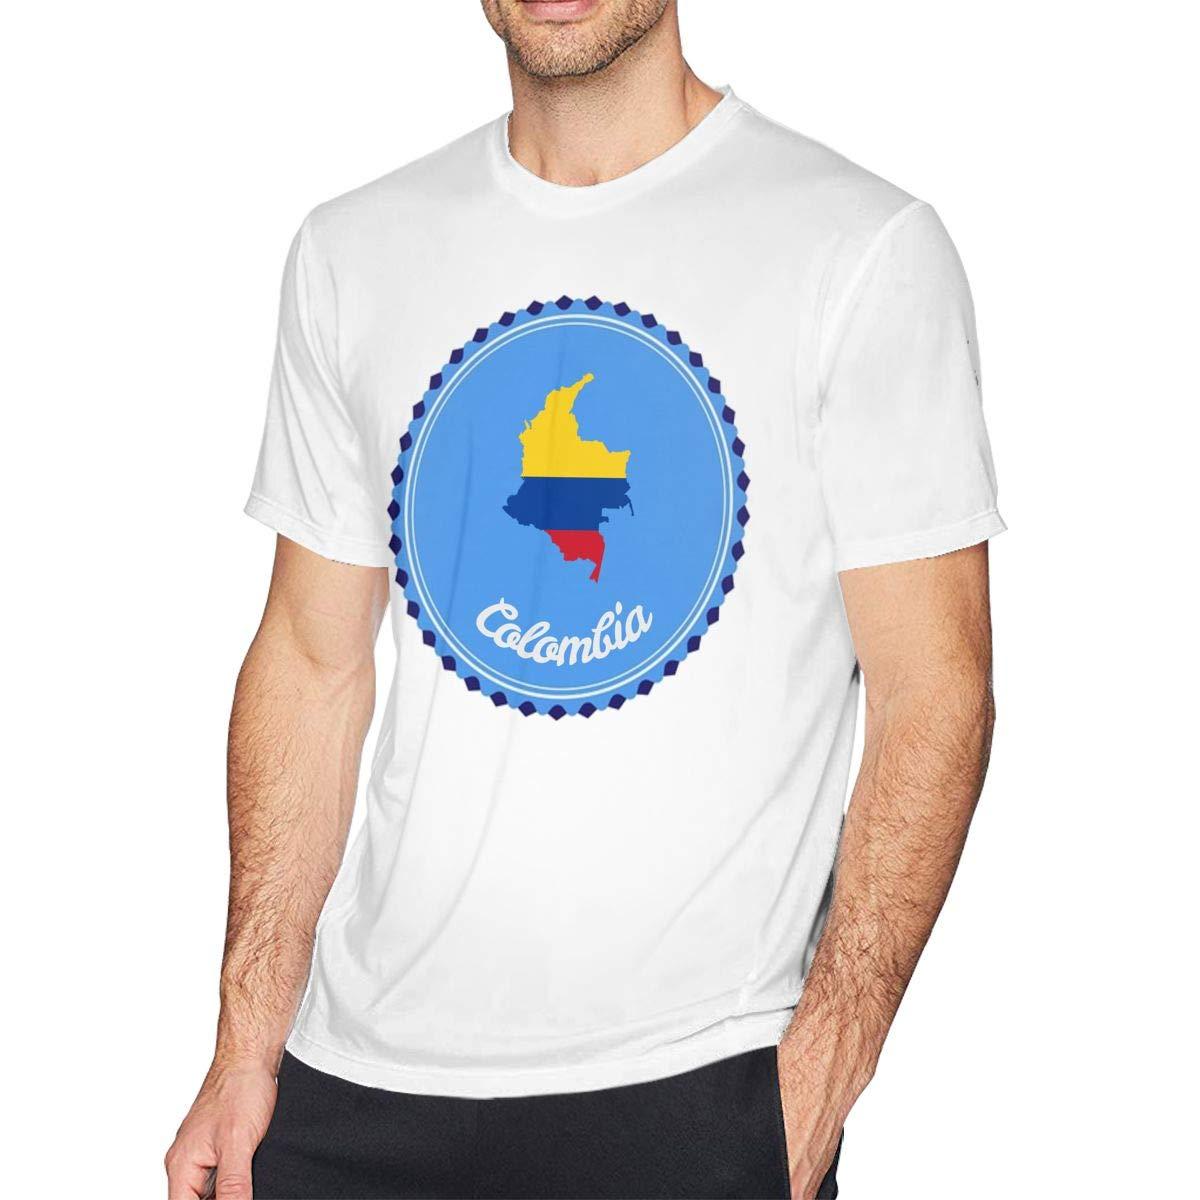 Casual Shirt for Men Teenagers New York Mens Shirt Short Sleeve T-Shirt